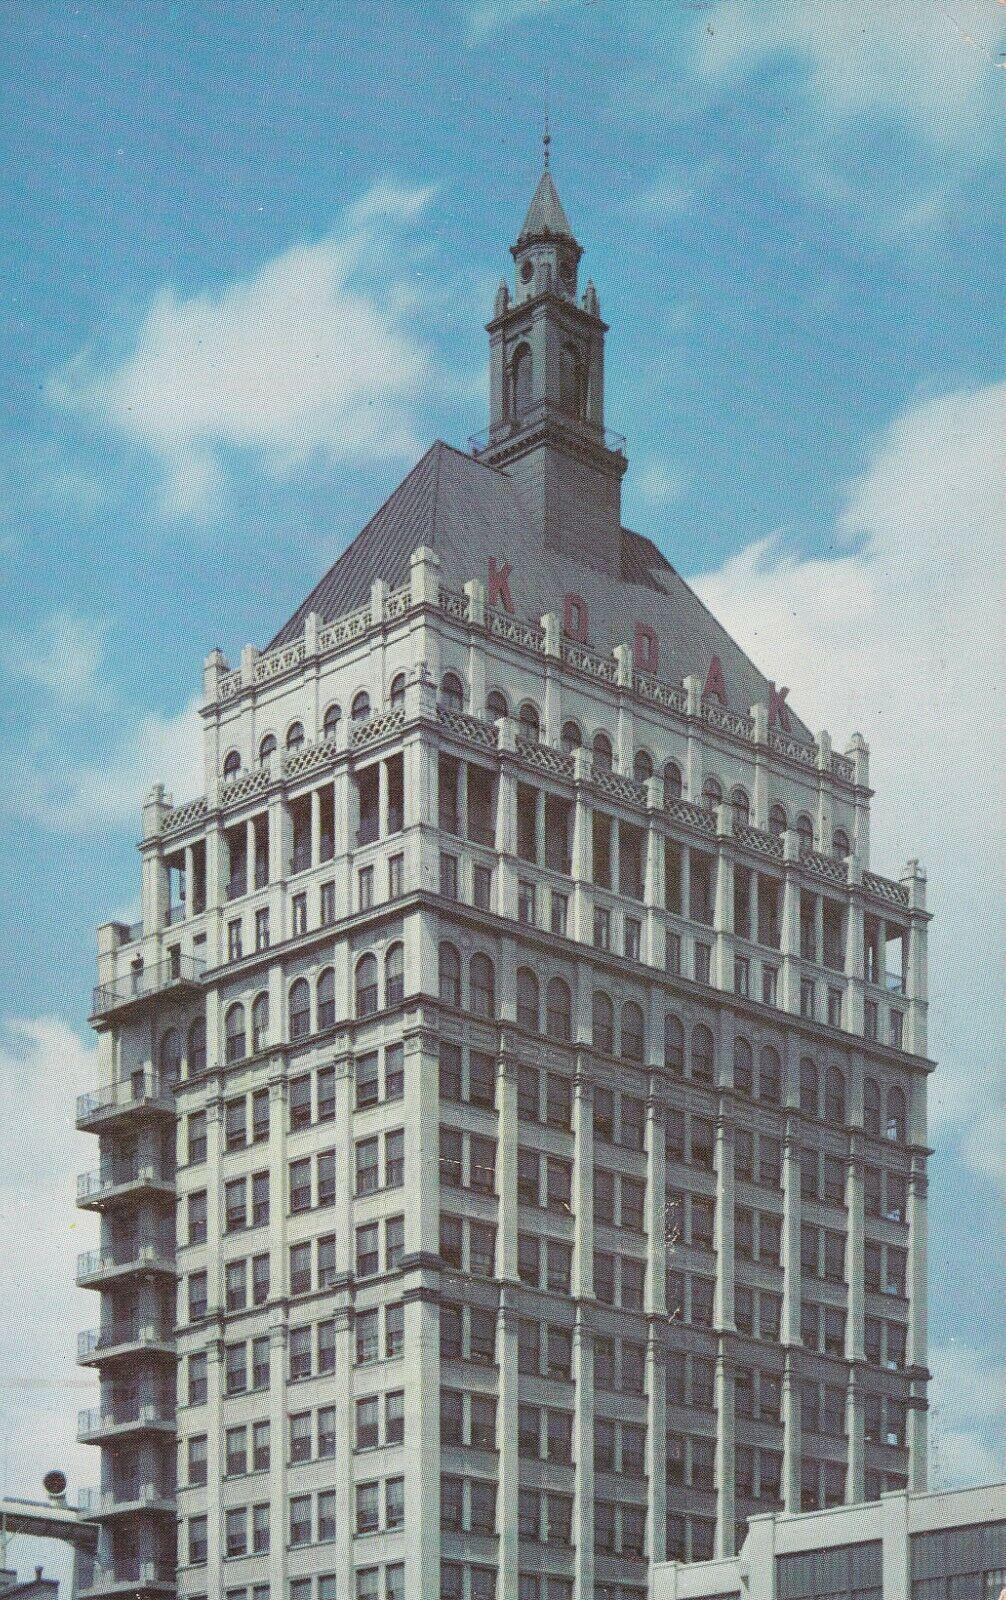 P/C of The Kodak Office Building, 19 stories, Rochester